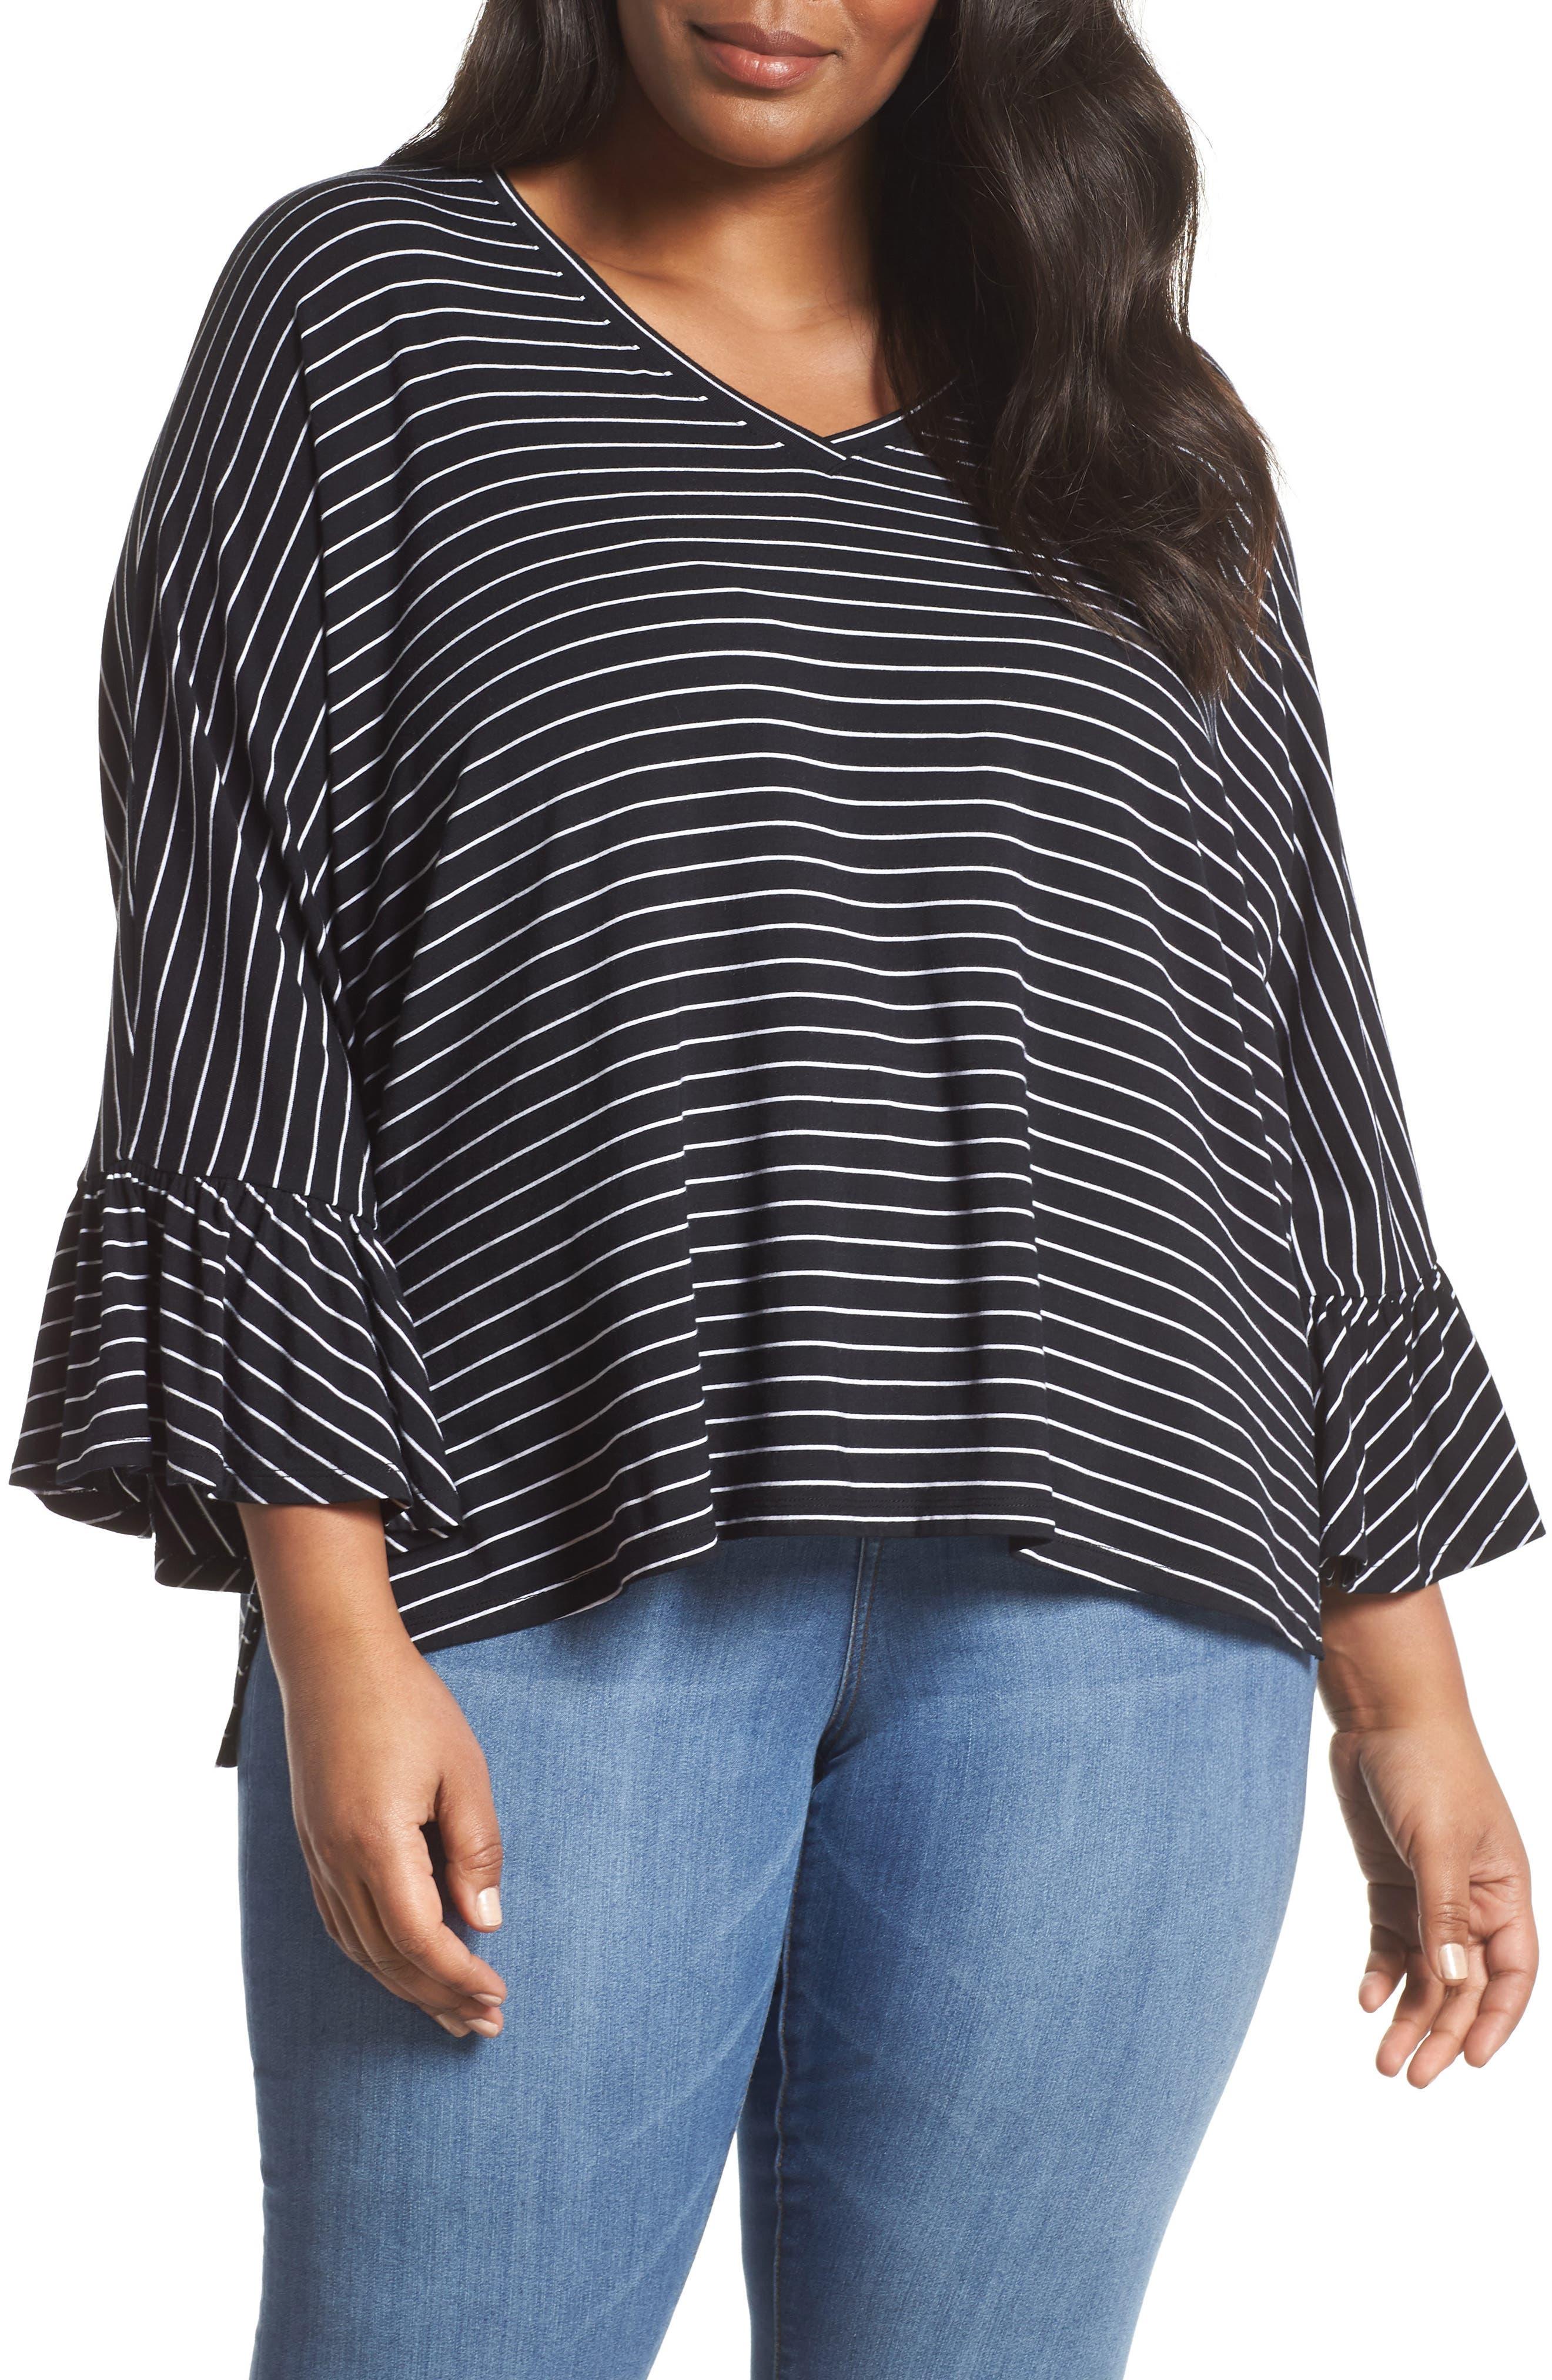 Ruffle Sleeve Knit Top,                             Main thumbnail 1, color,                             BLACK/ WHITE STRIPE